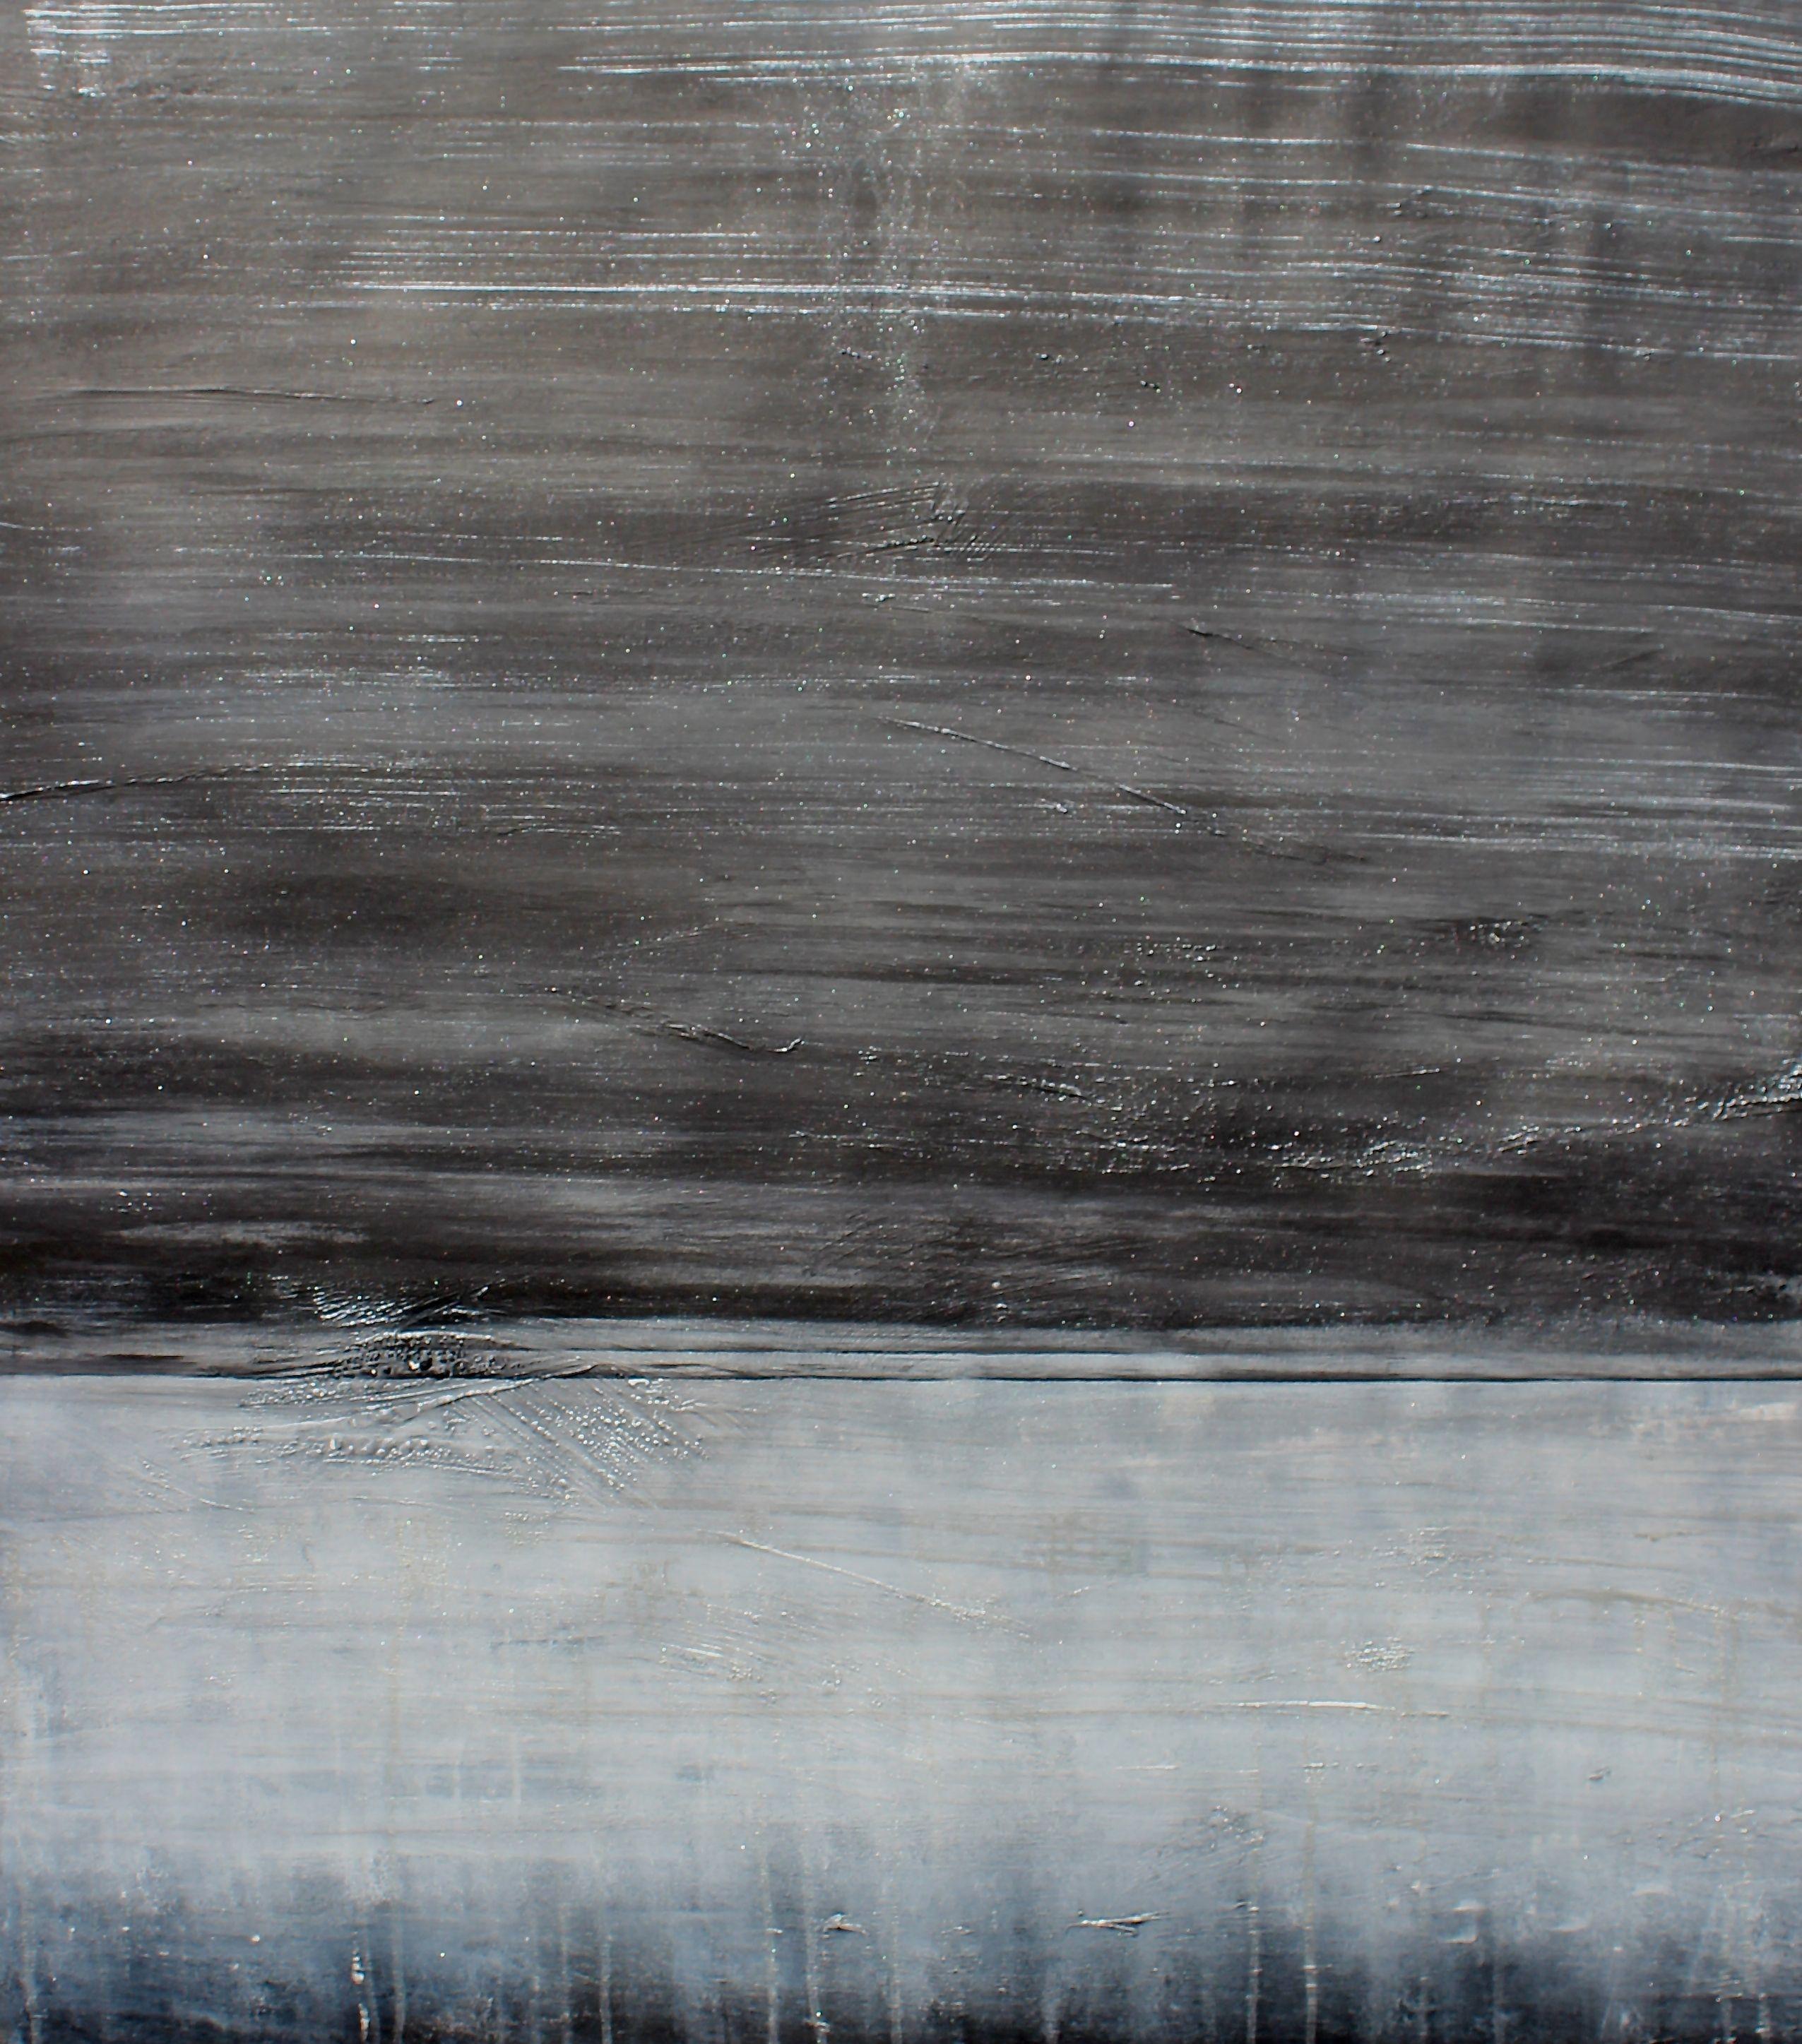 Night Illuminated, Painting, Acrylic on Paper